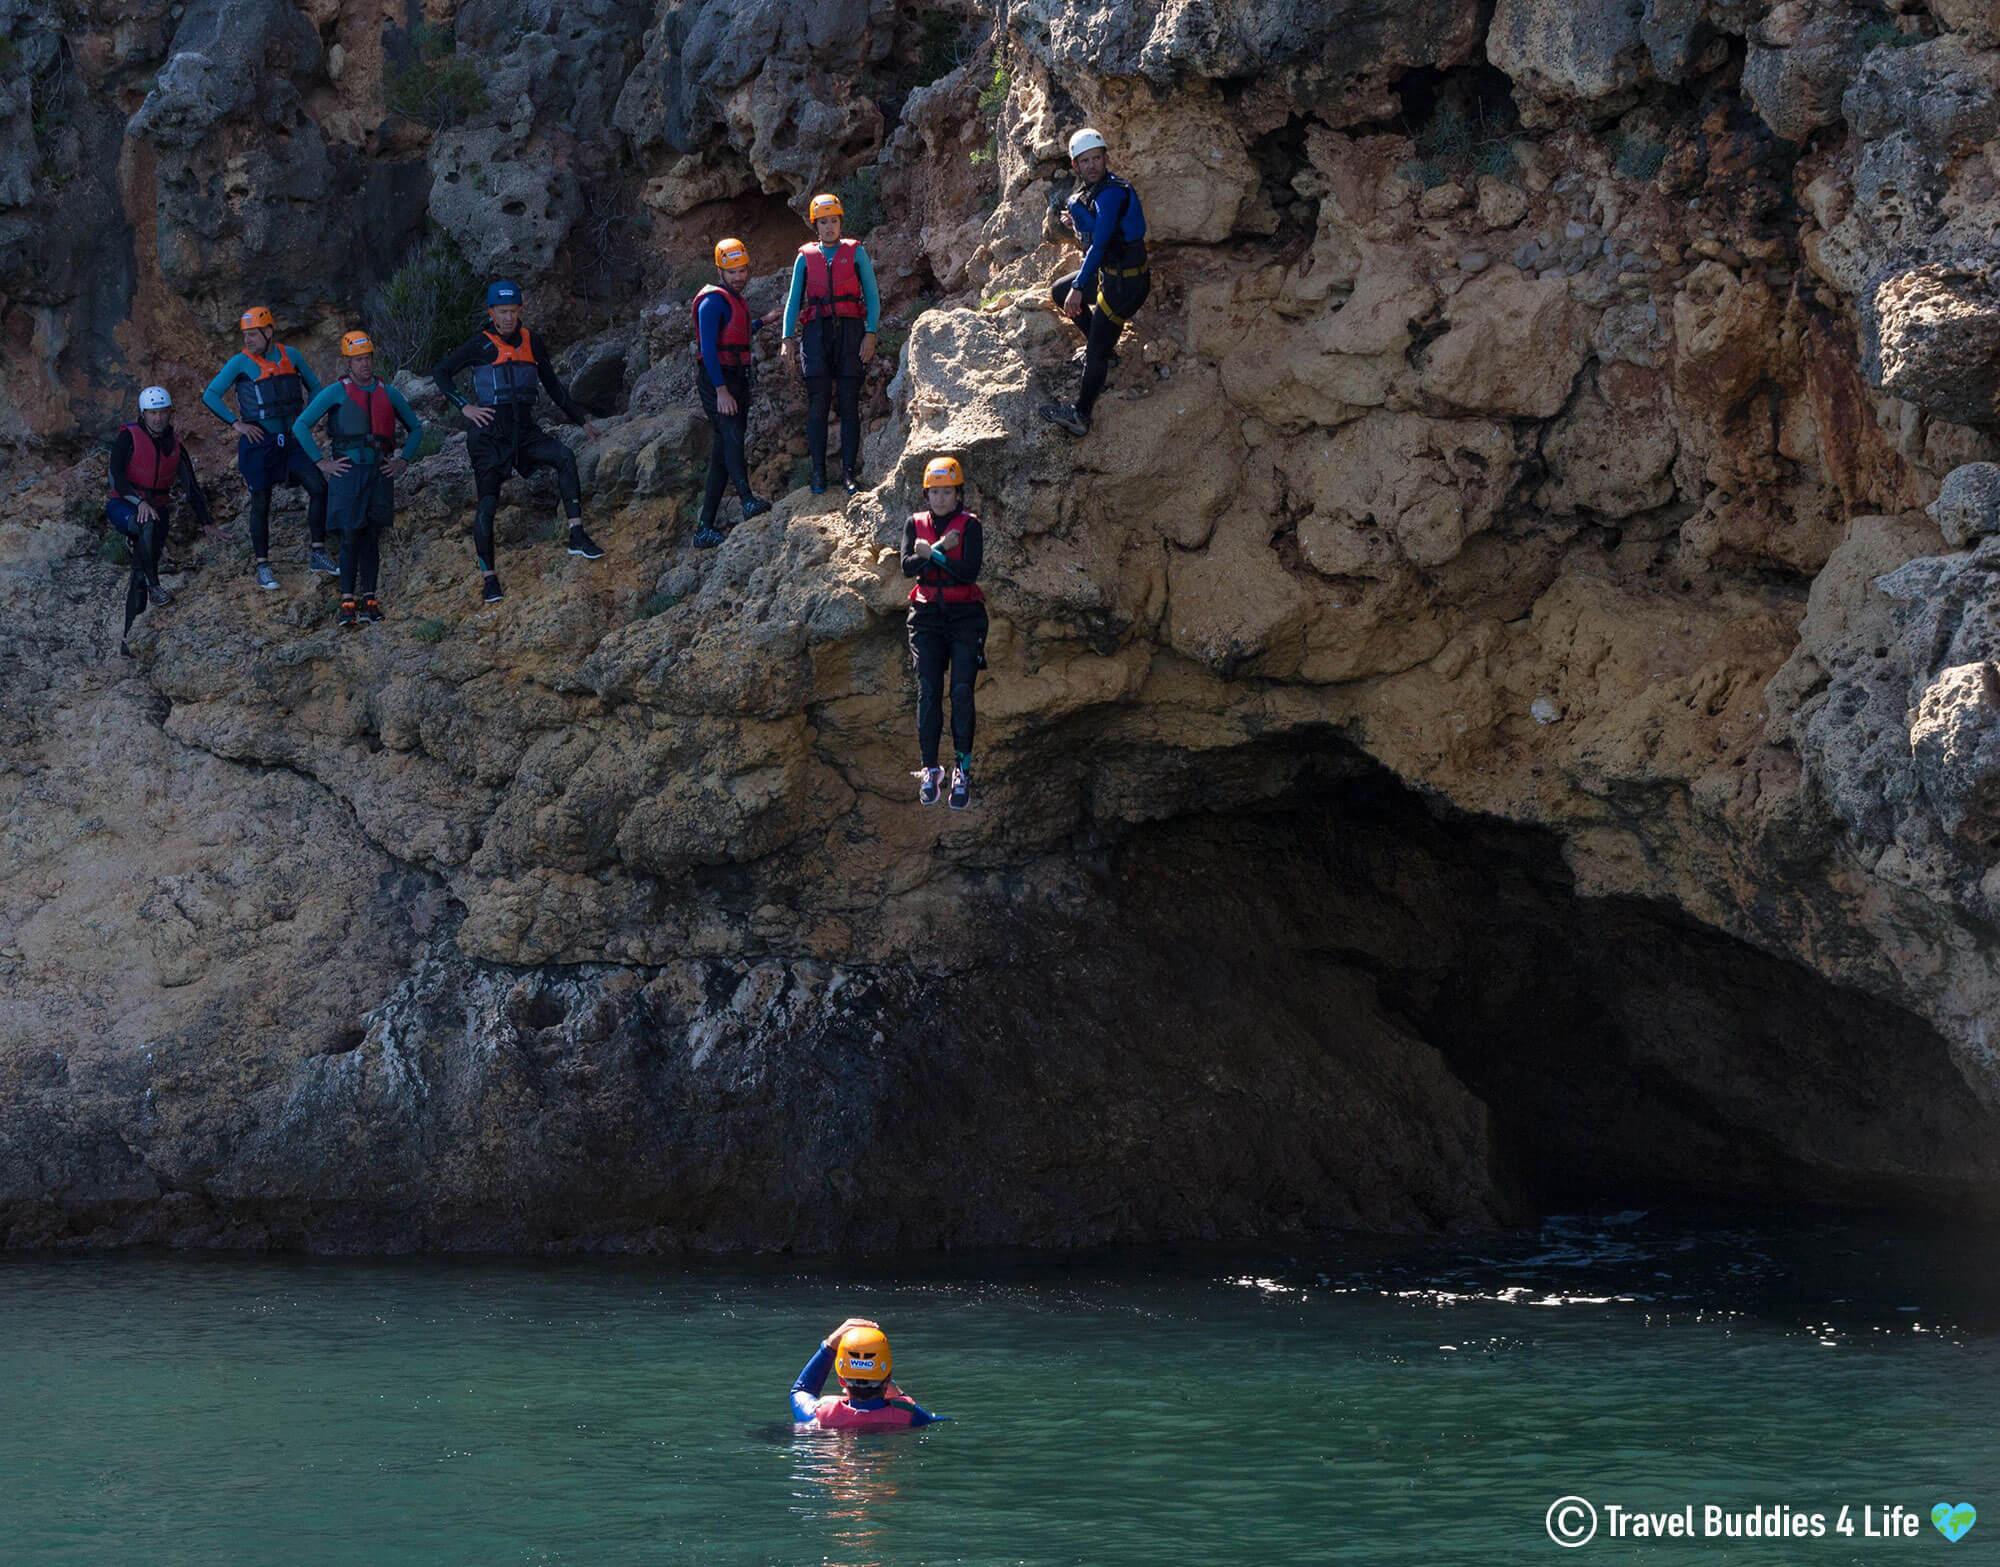 Cliff Jumper Entering the Water as WIND Coasteers the Serra da Arrábida Natural Park